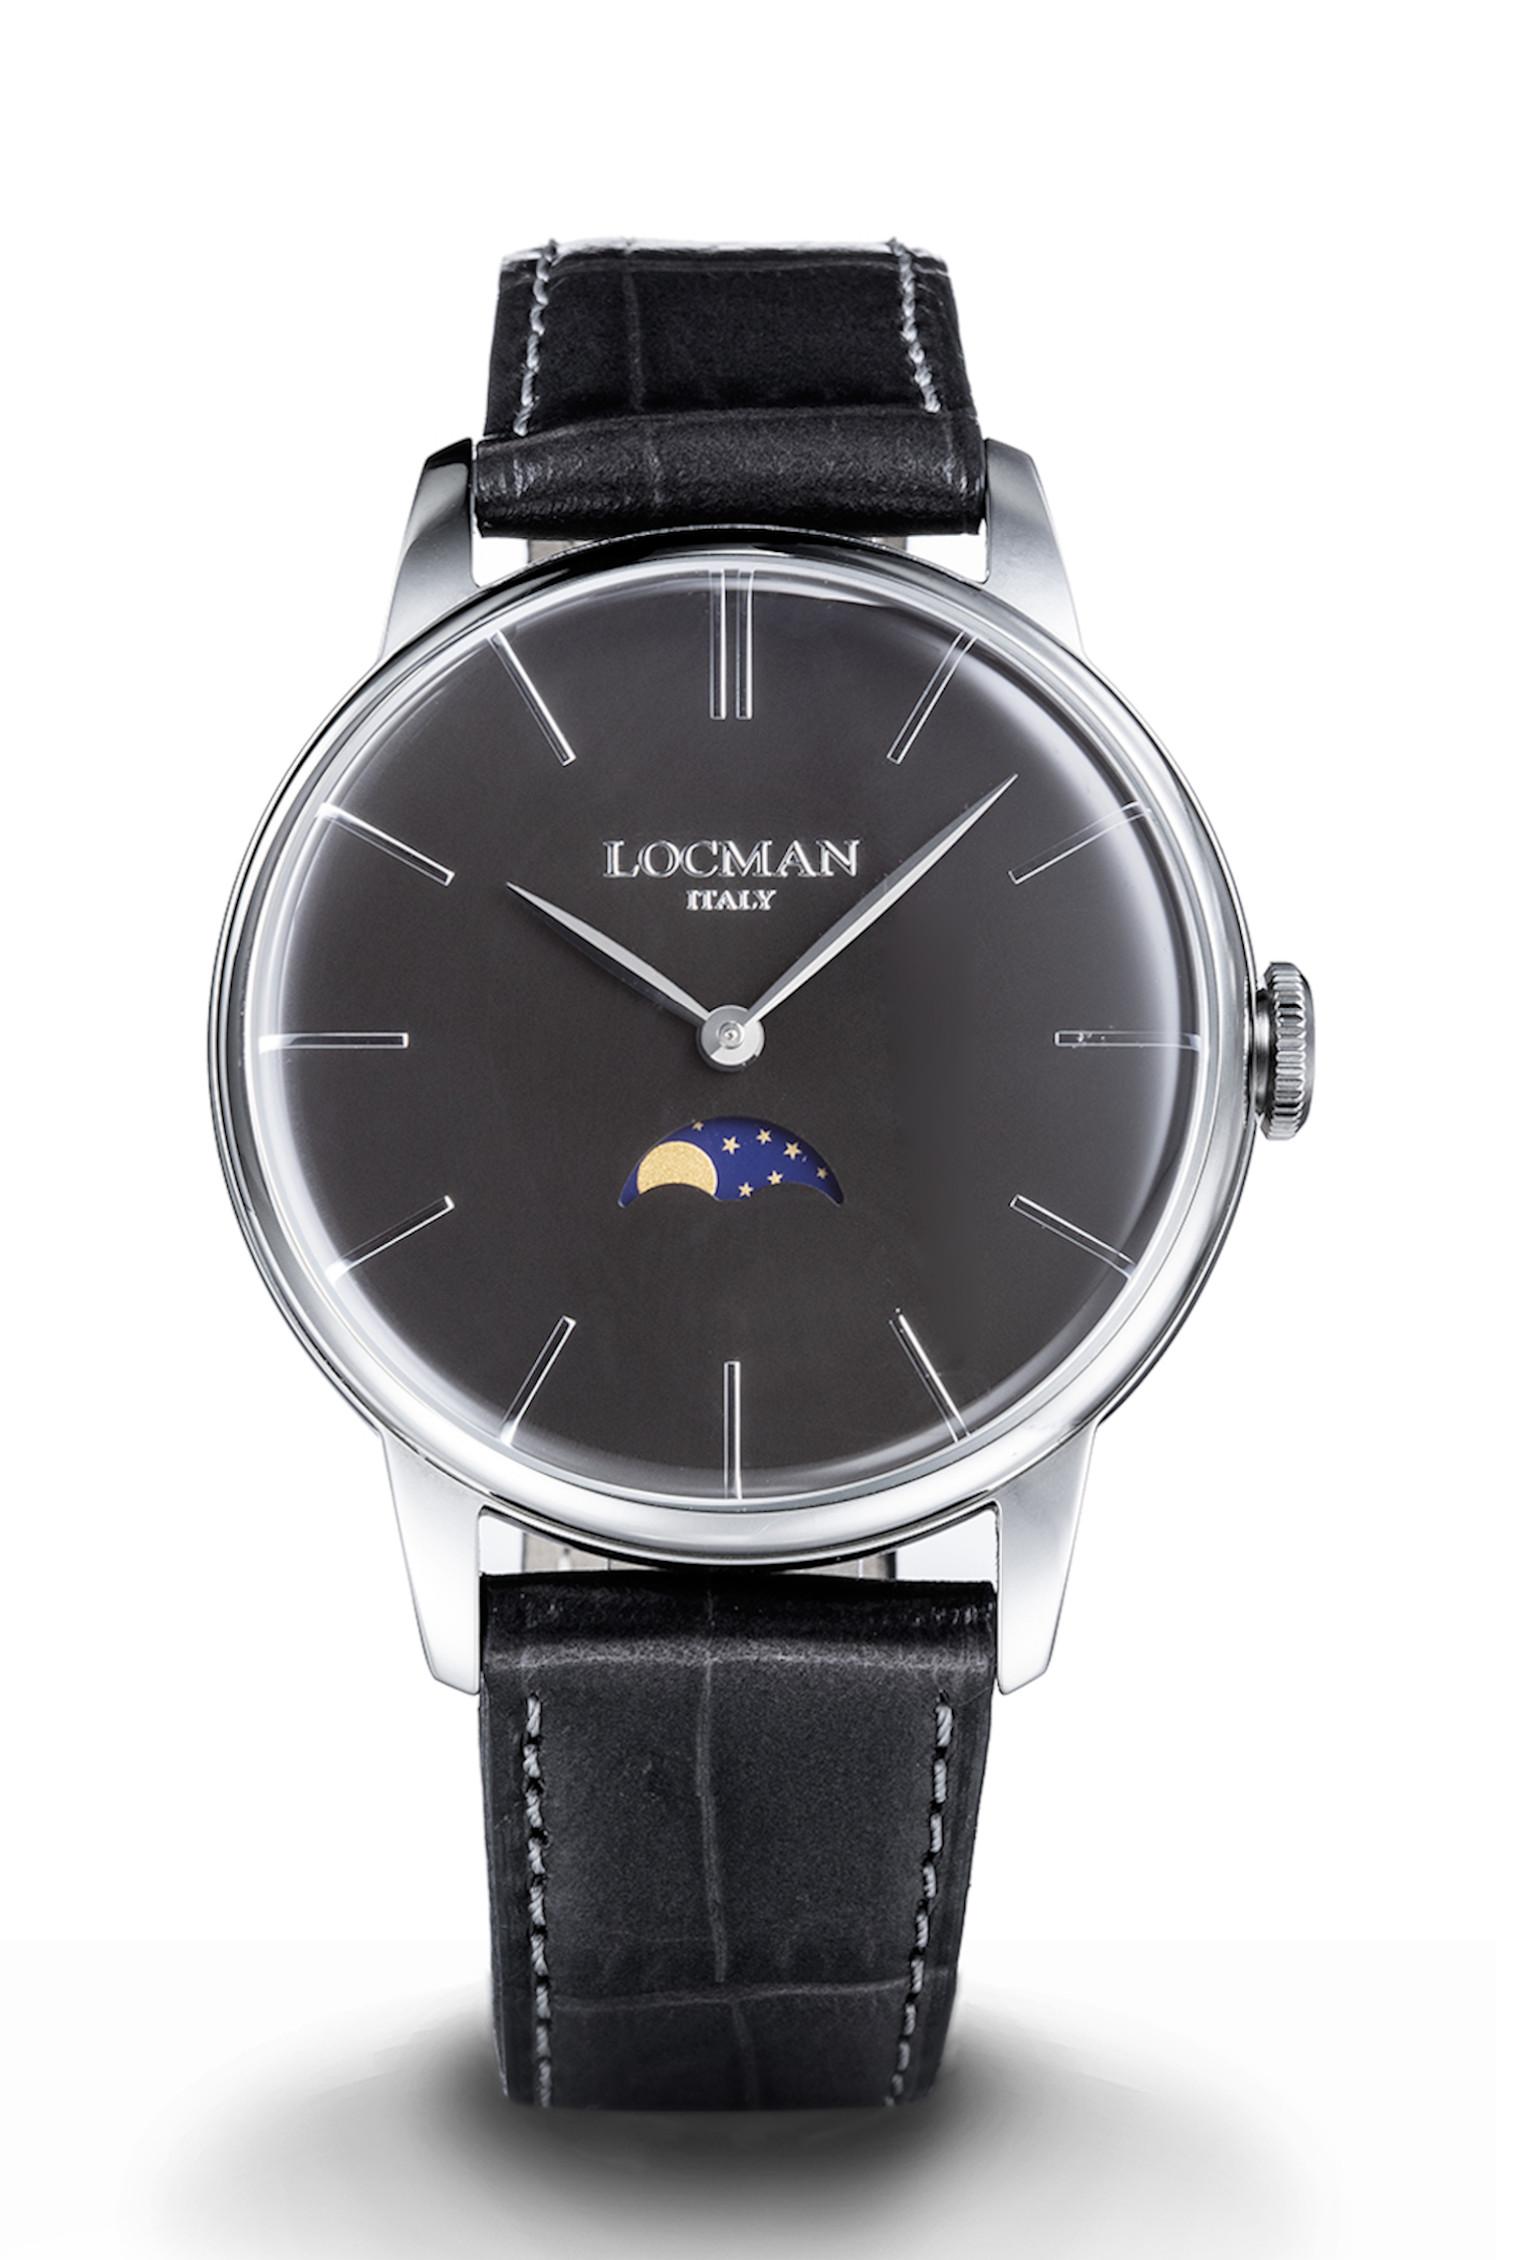 Locman 1960 Fasi Lunari0256A01A-00BKNKPK